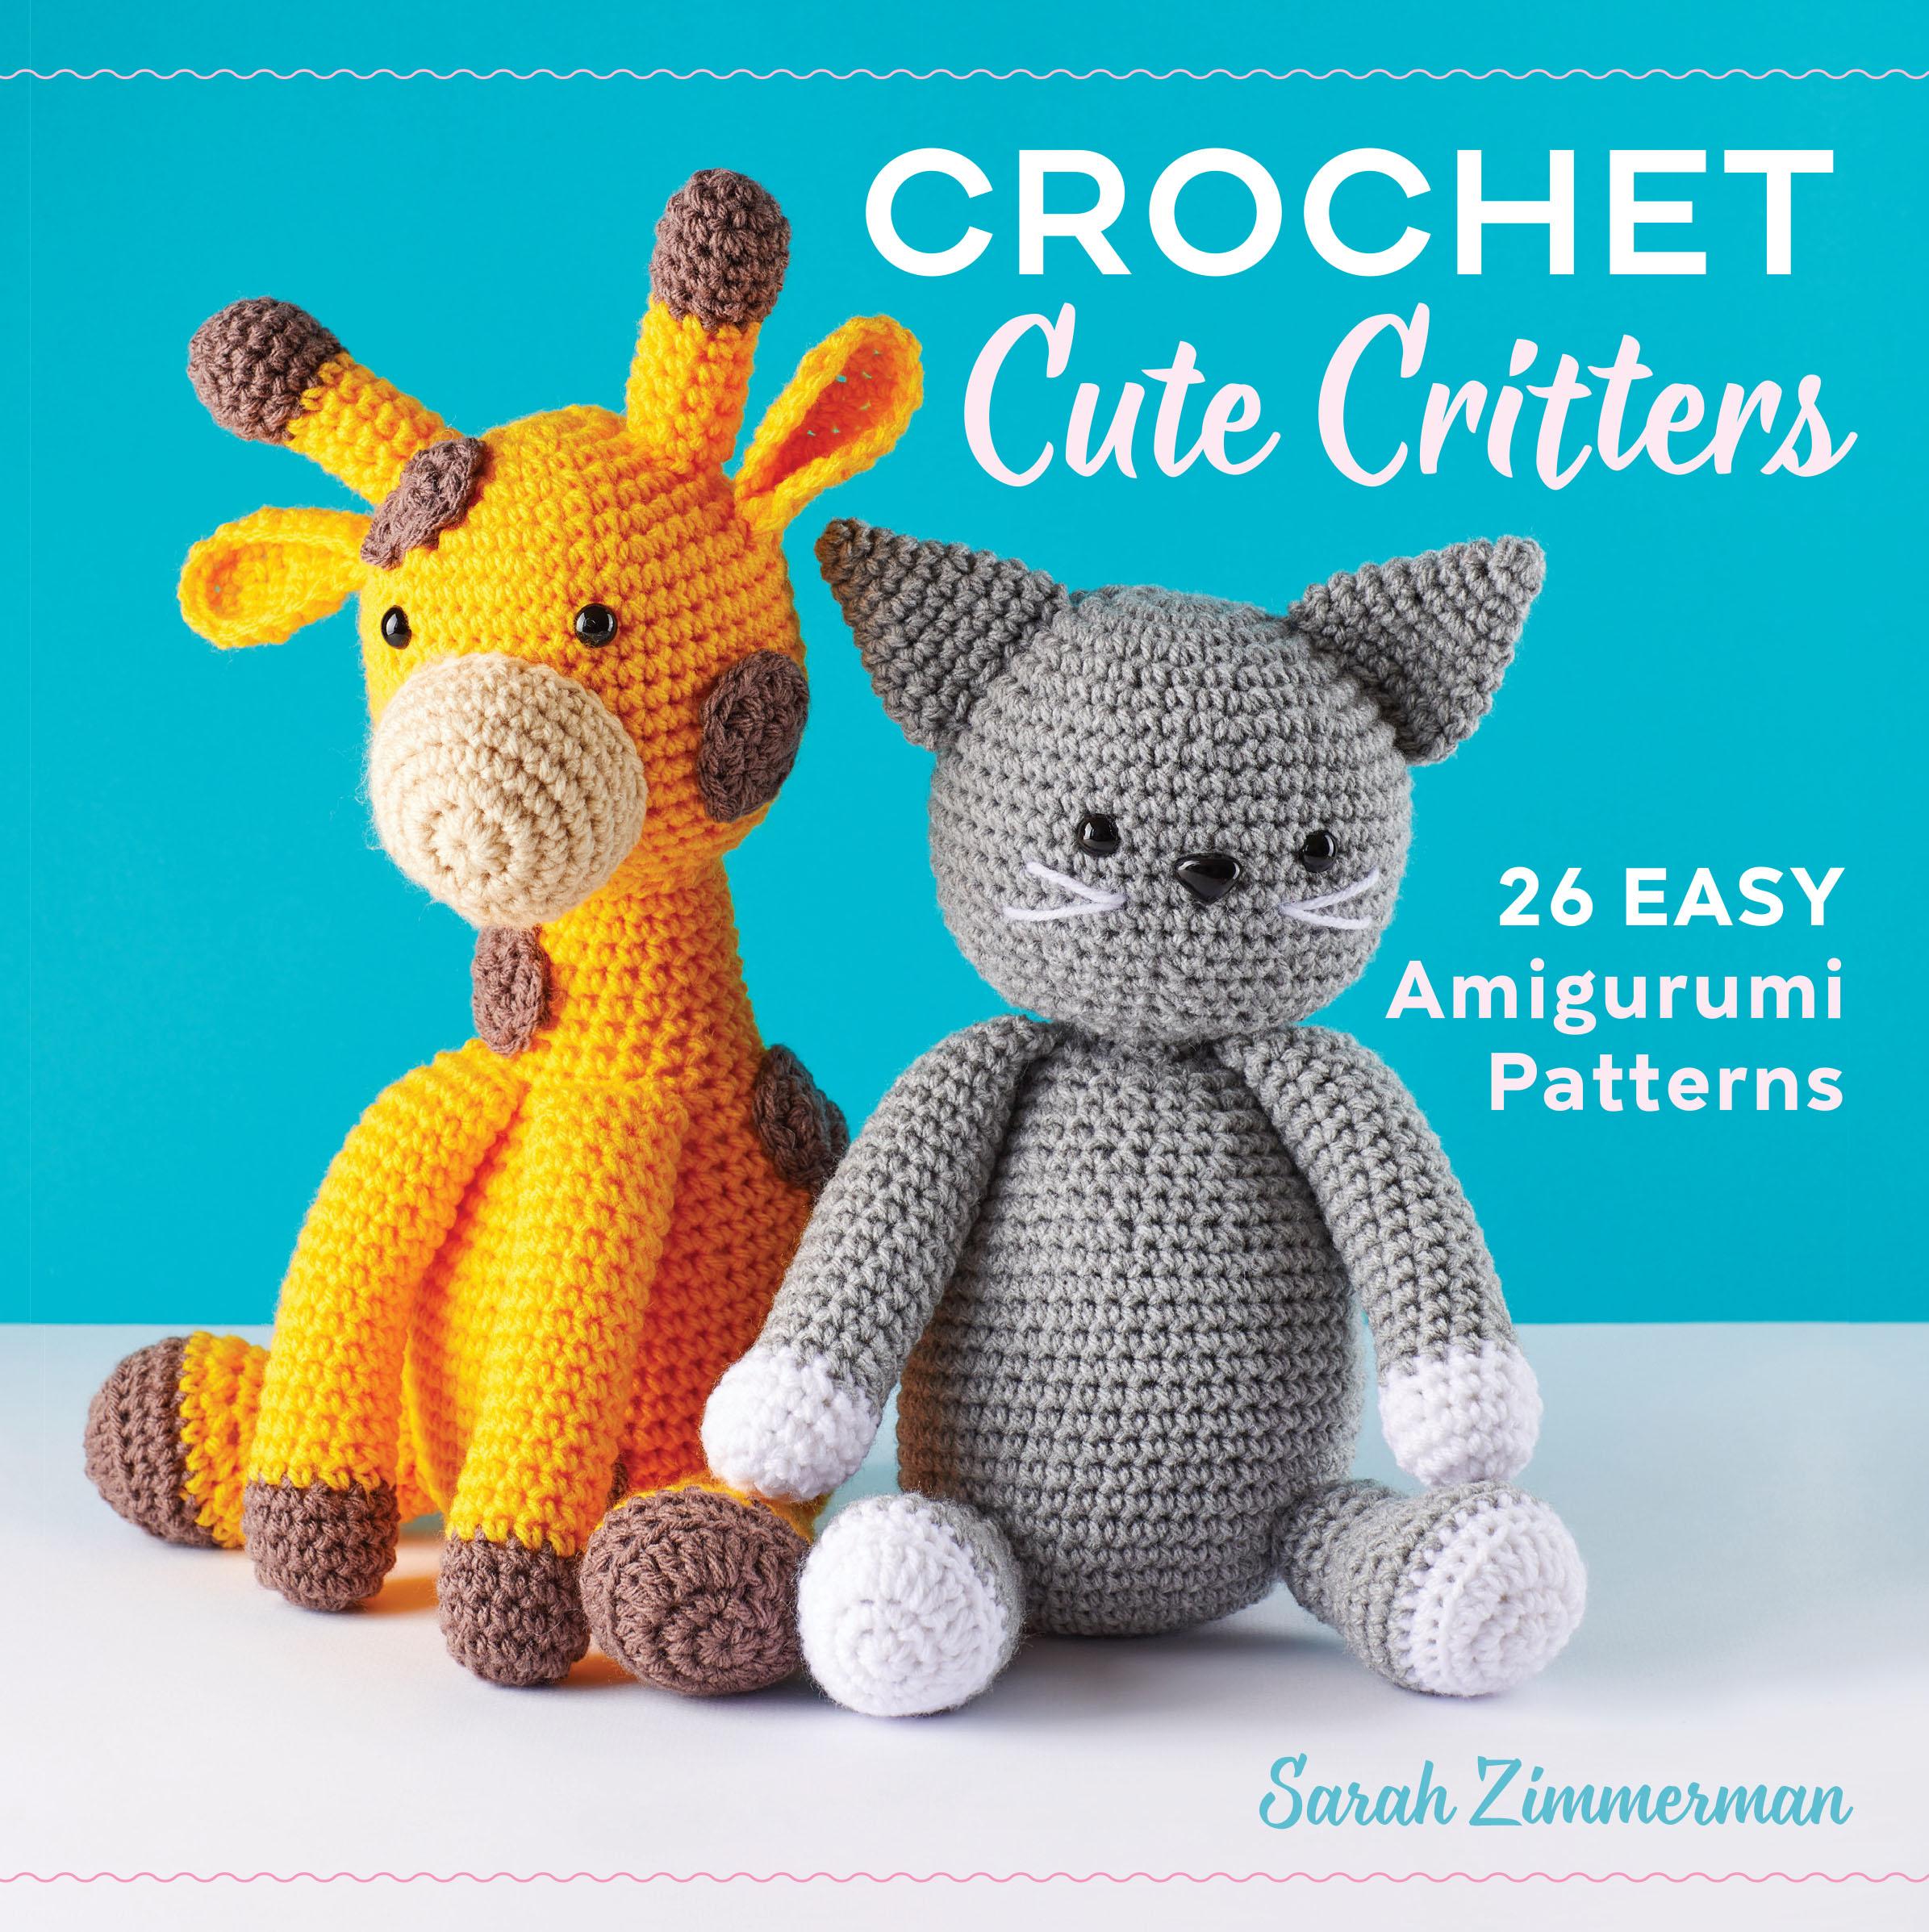 Crochet Cute Critters Amigurumi Review & Giveaway